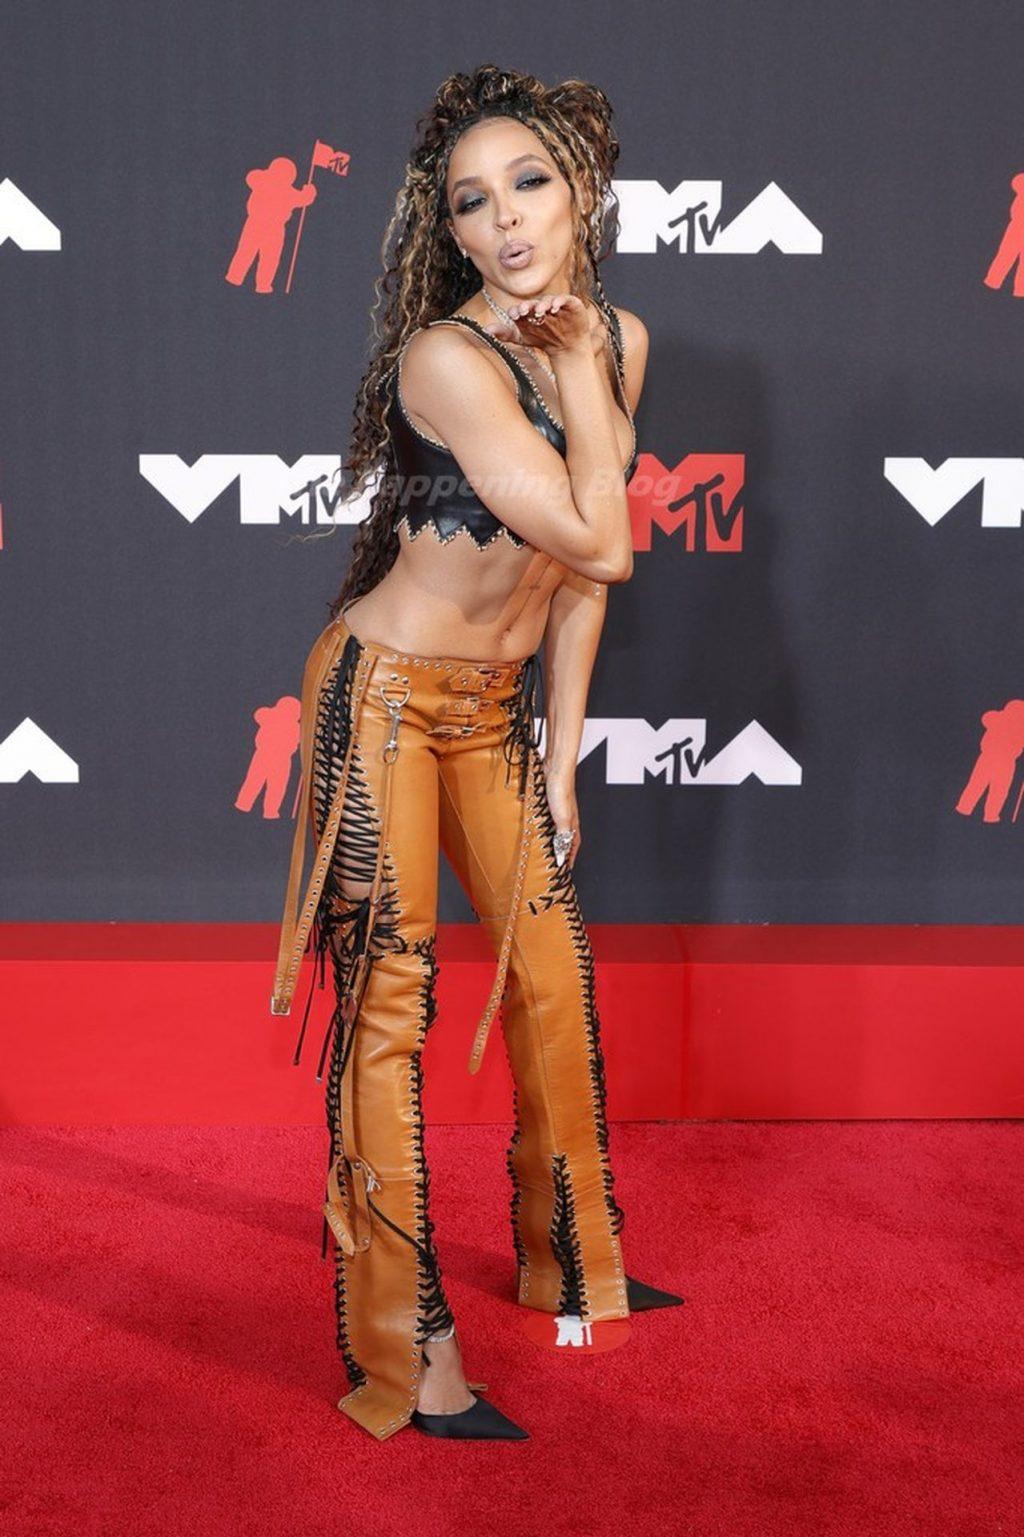 Tinashe Looks Crazy at the 2021 MTV Video Music Awards (24 Photos)